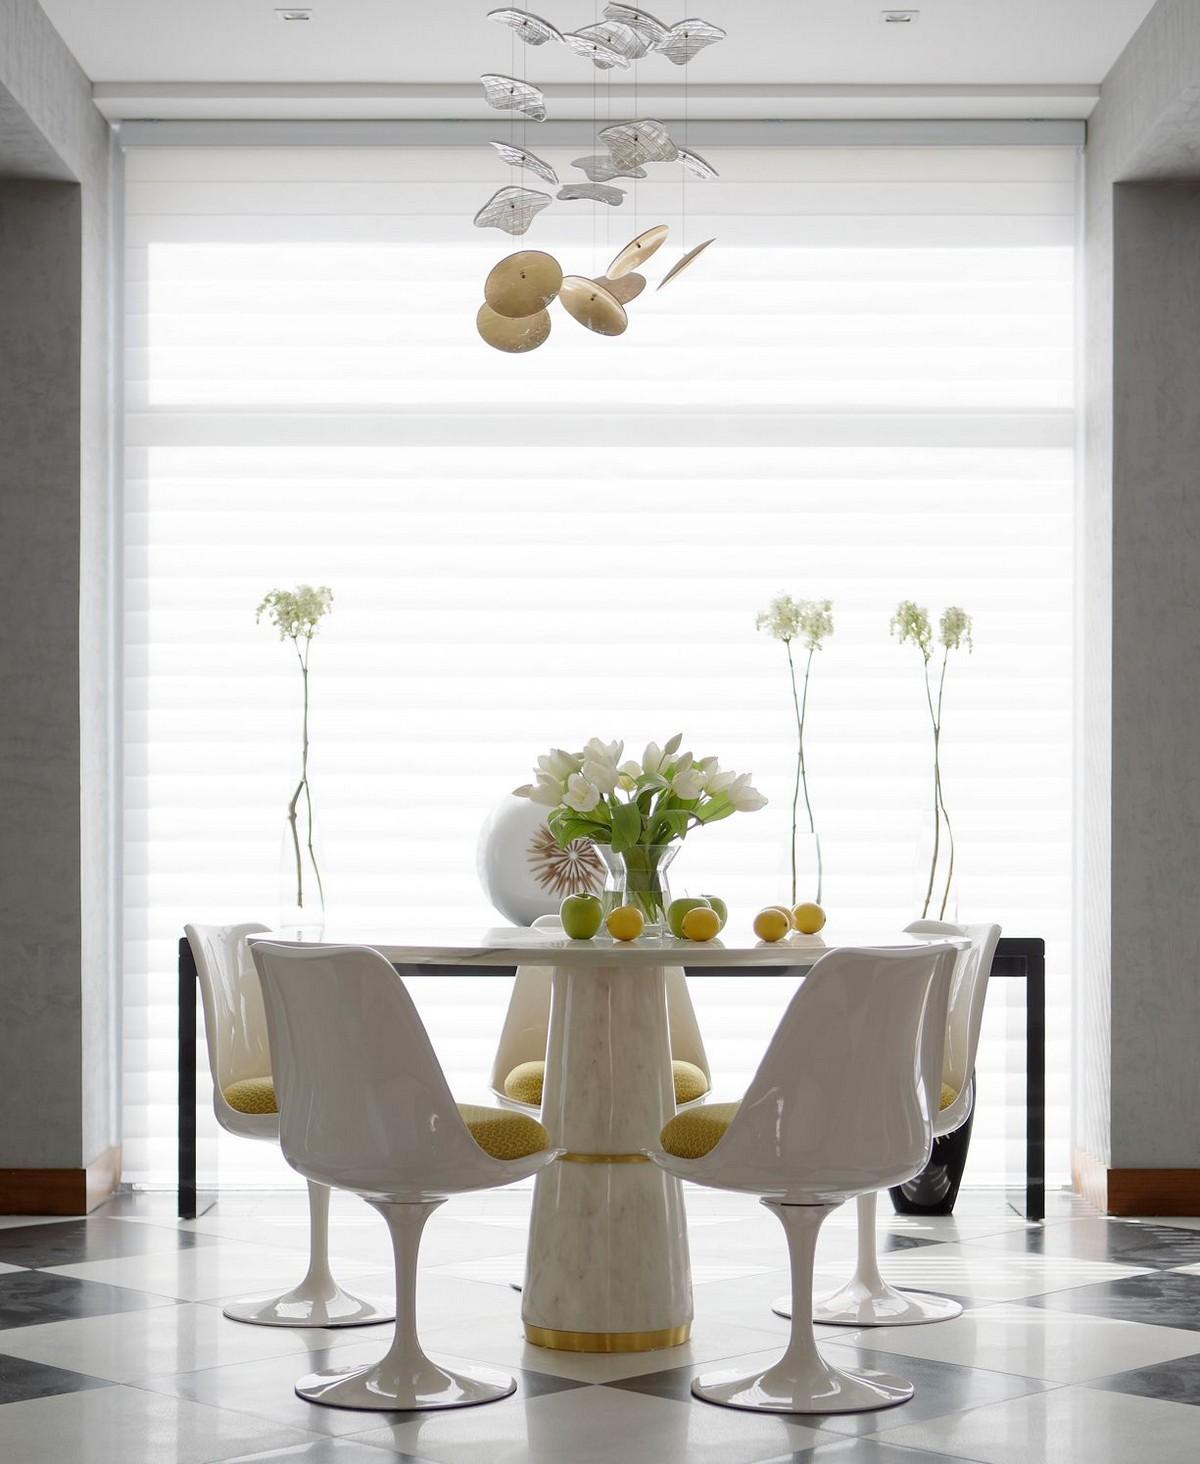 Top 5 Luxury Dining Tables By Brabbu dining tables Top 5 Luxury Dining Tables By Brabbu agra